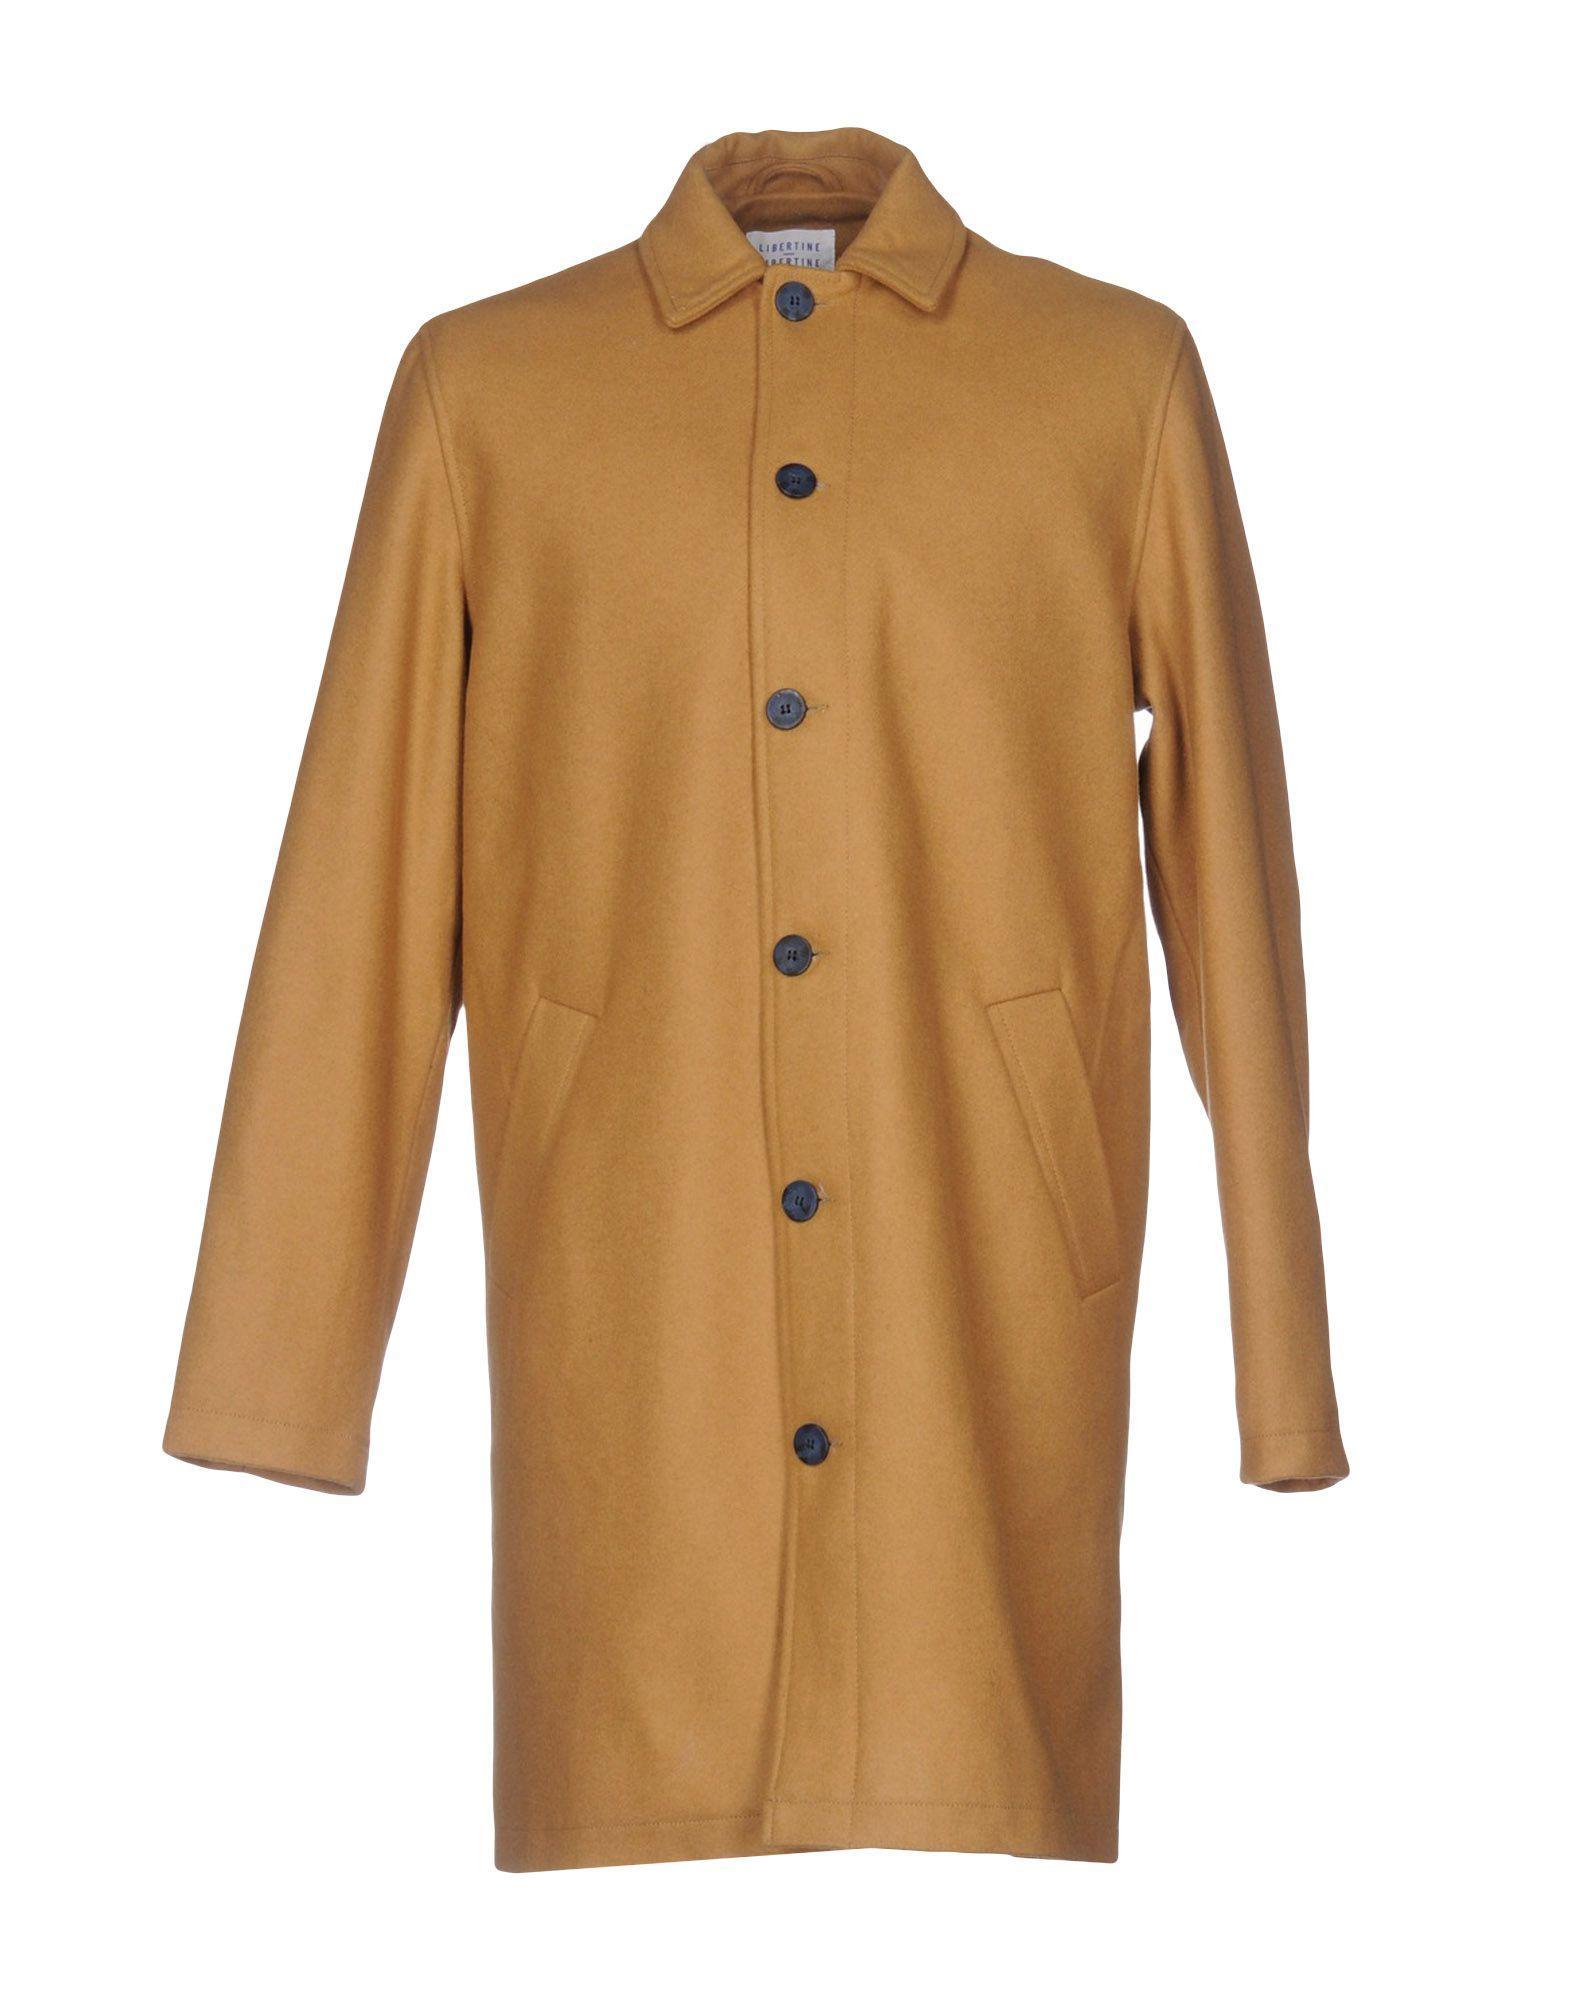 Libertine-libertine Coats In Camel